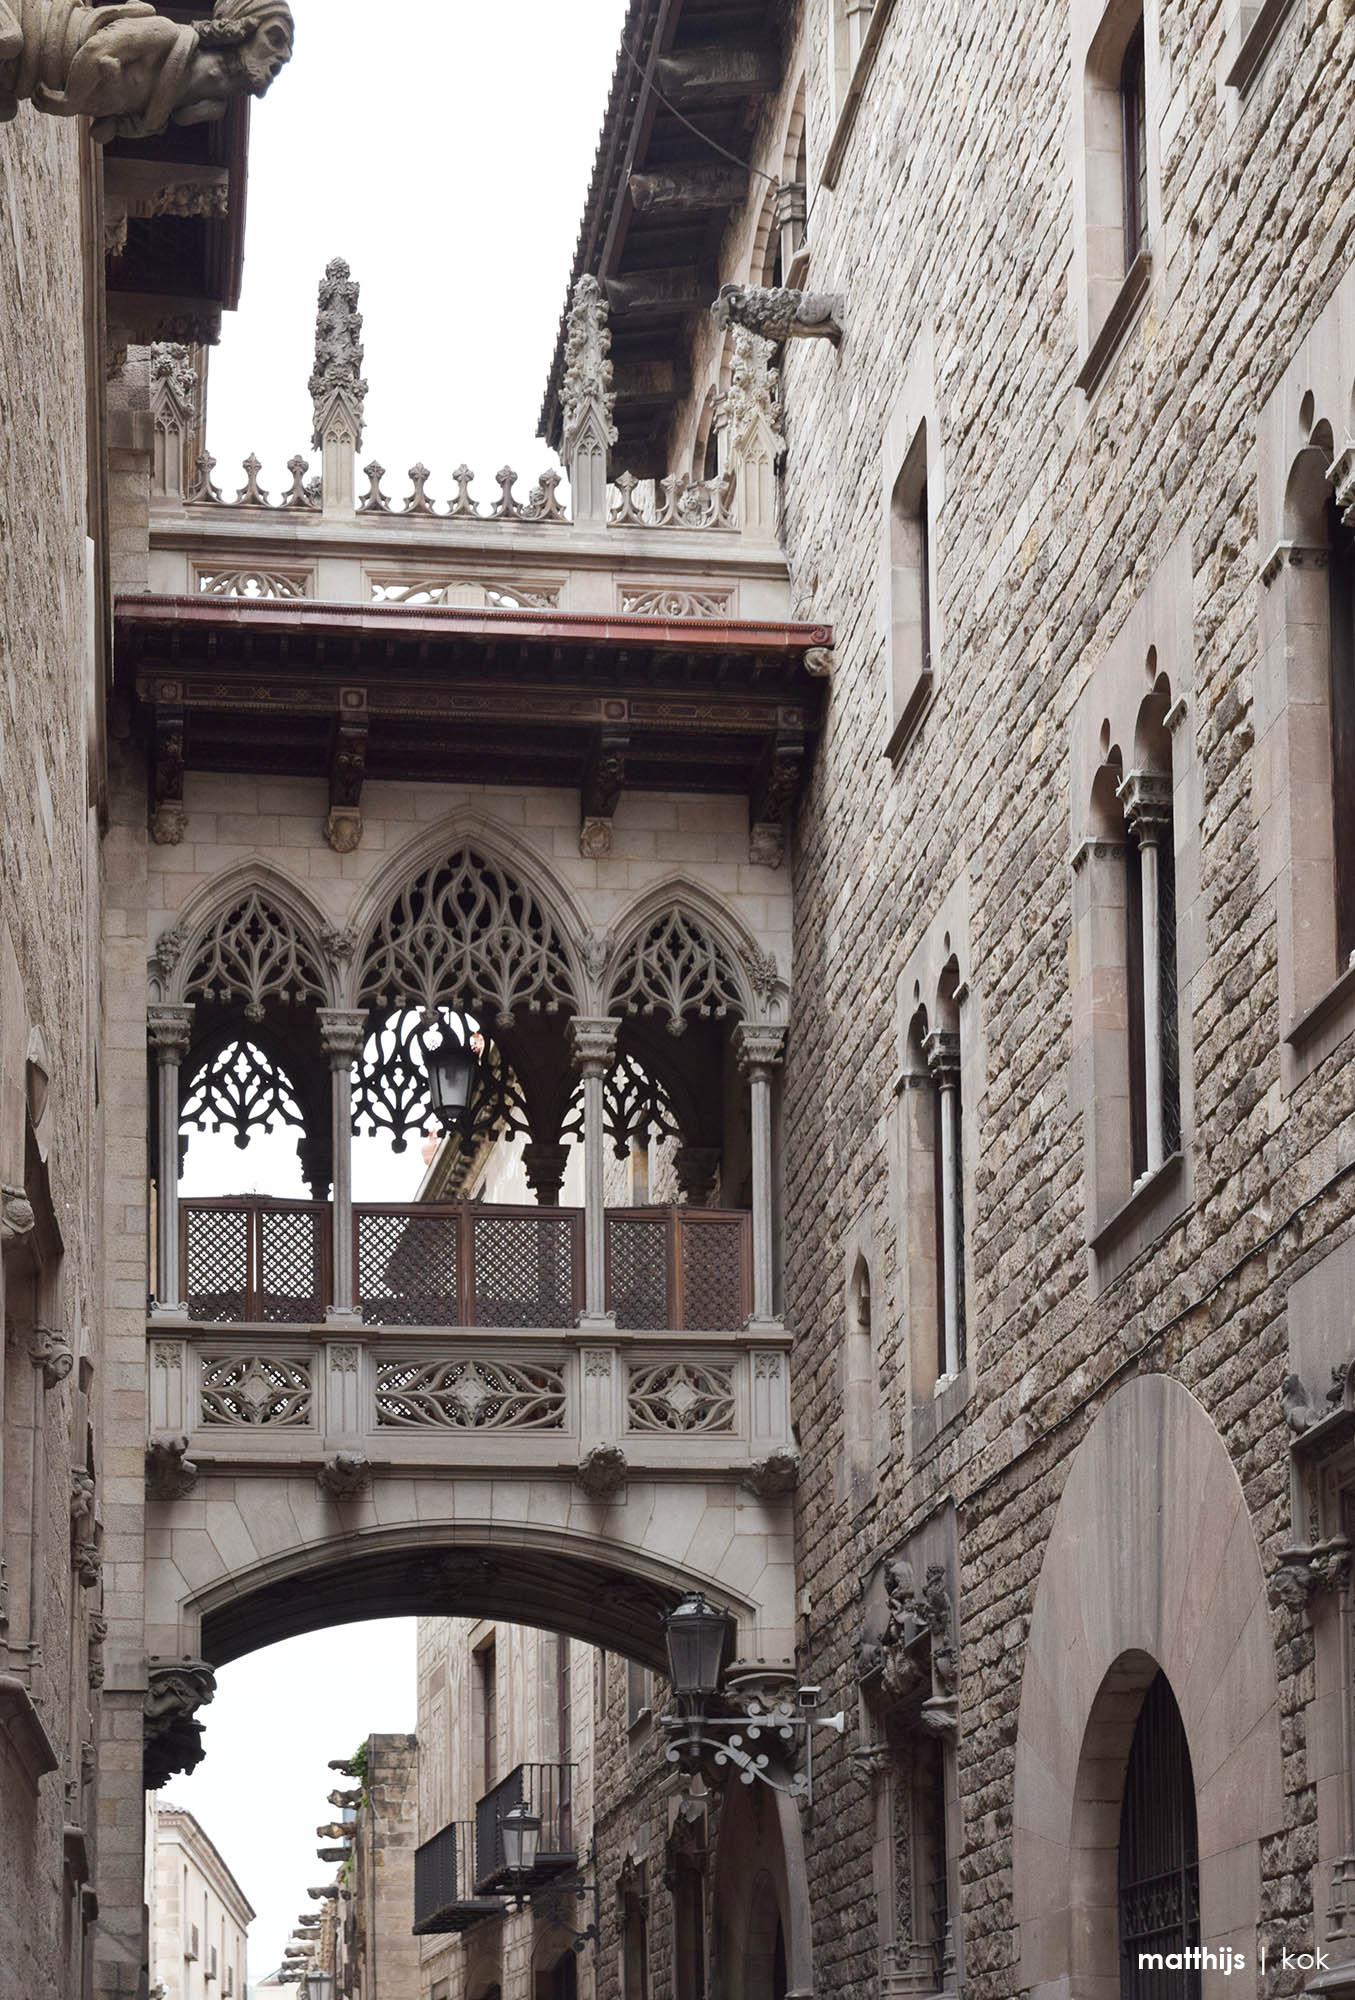 Barri Gòtic, Barcelona, Spain | Photo by Matthijs Kok